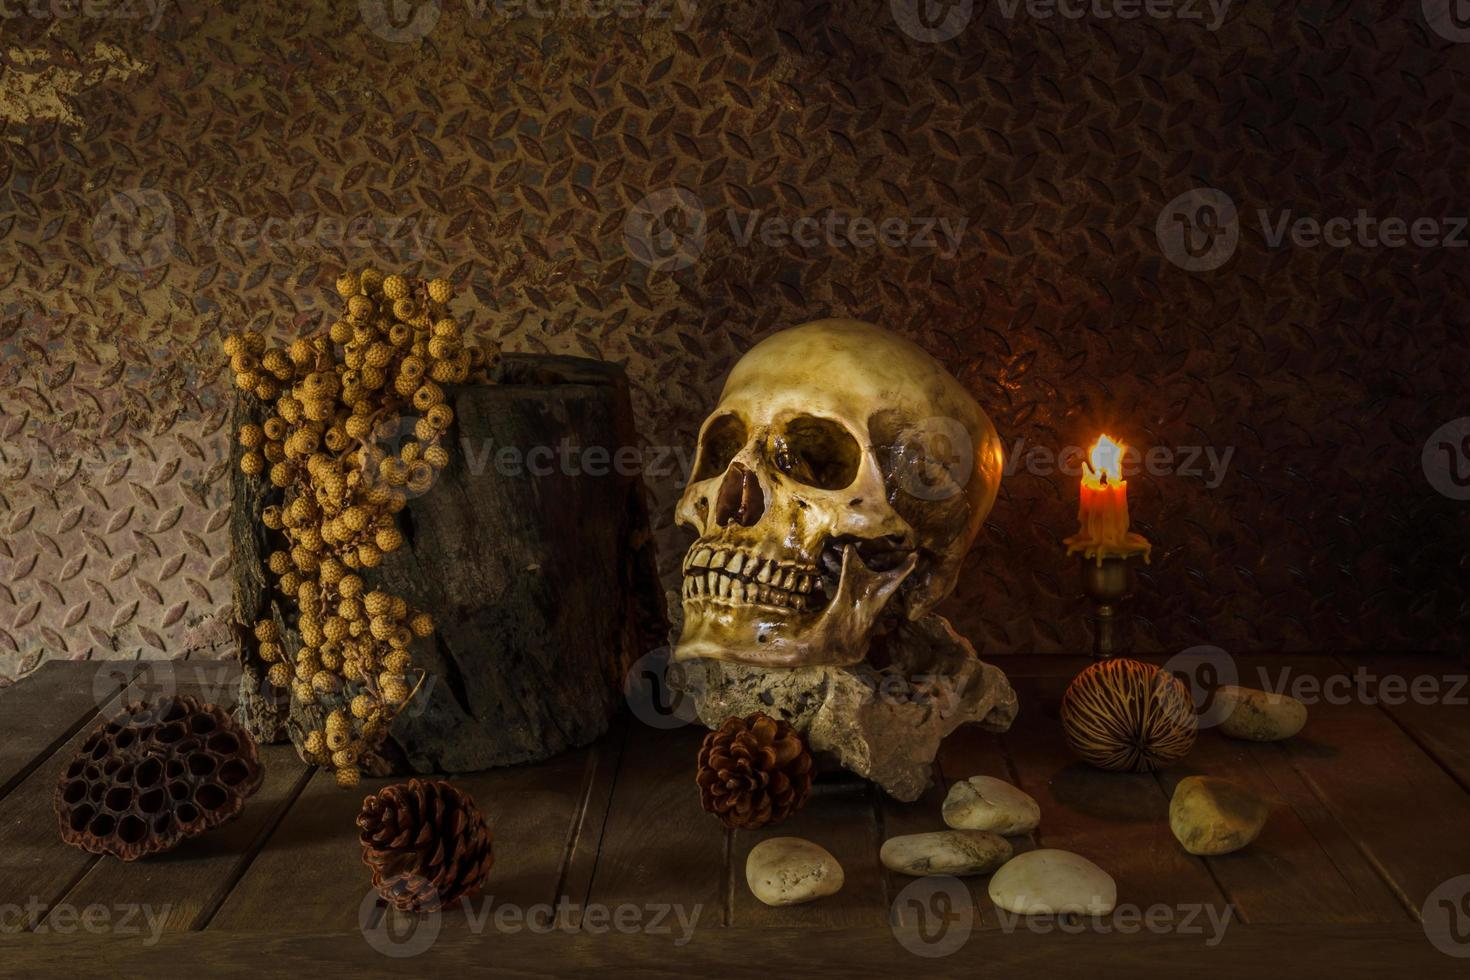 Still Life with a Skull. photo